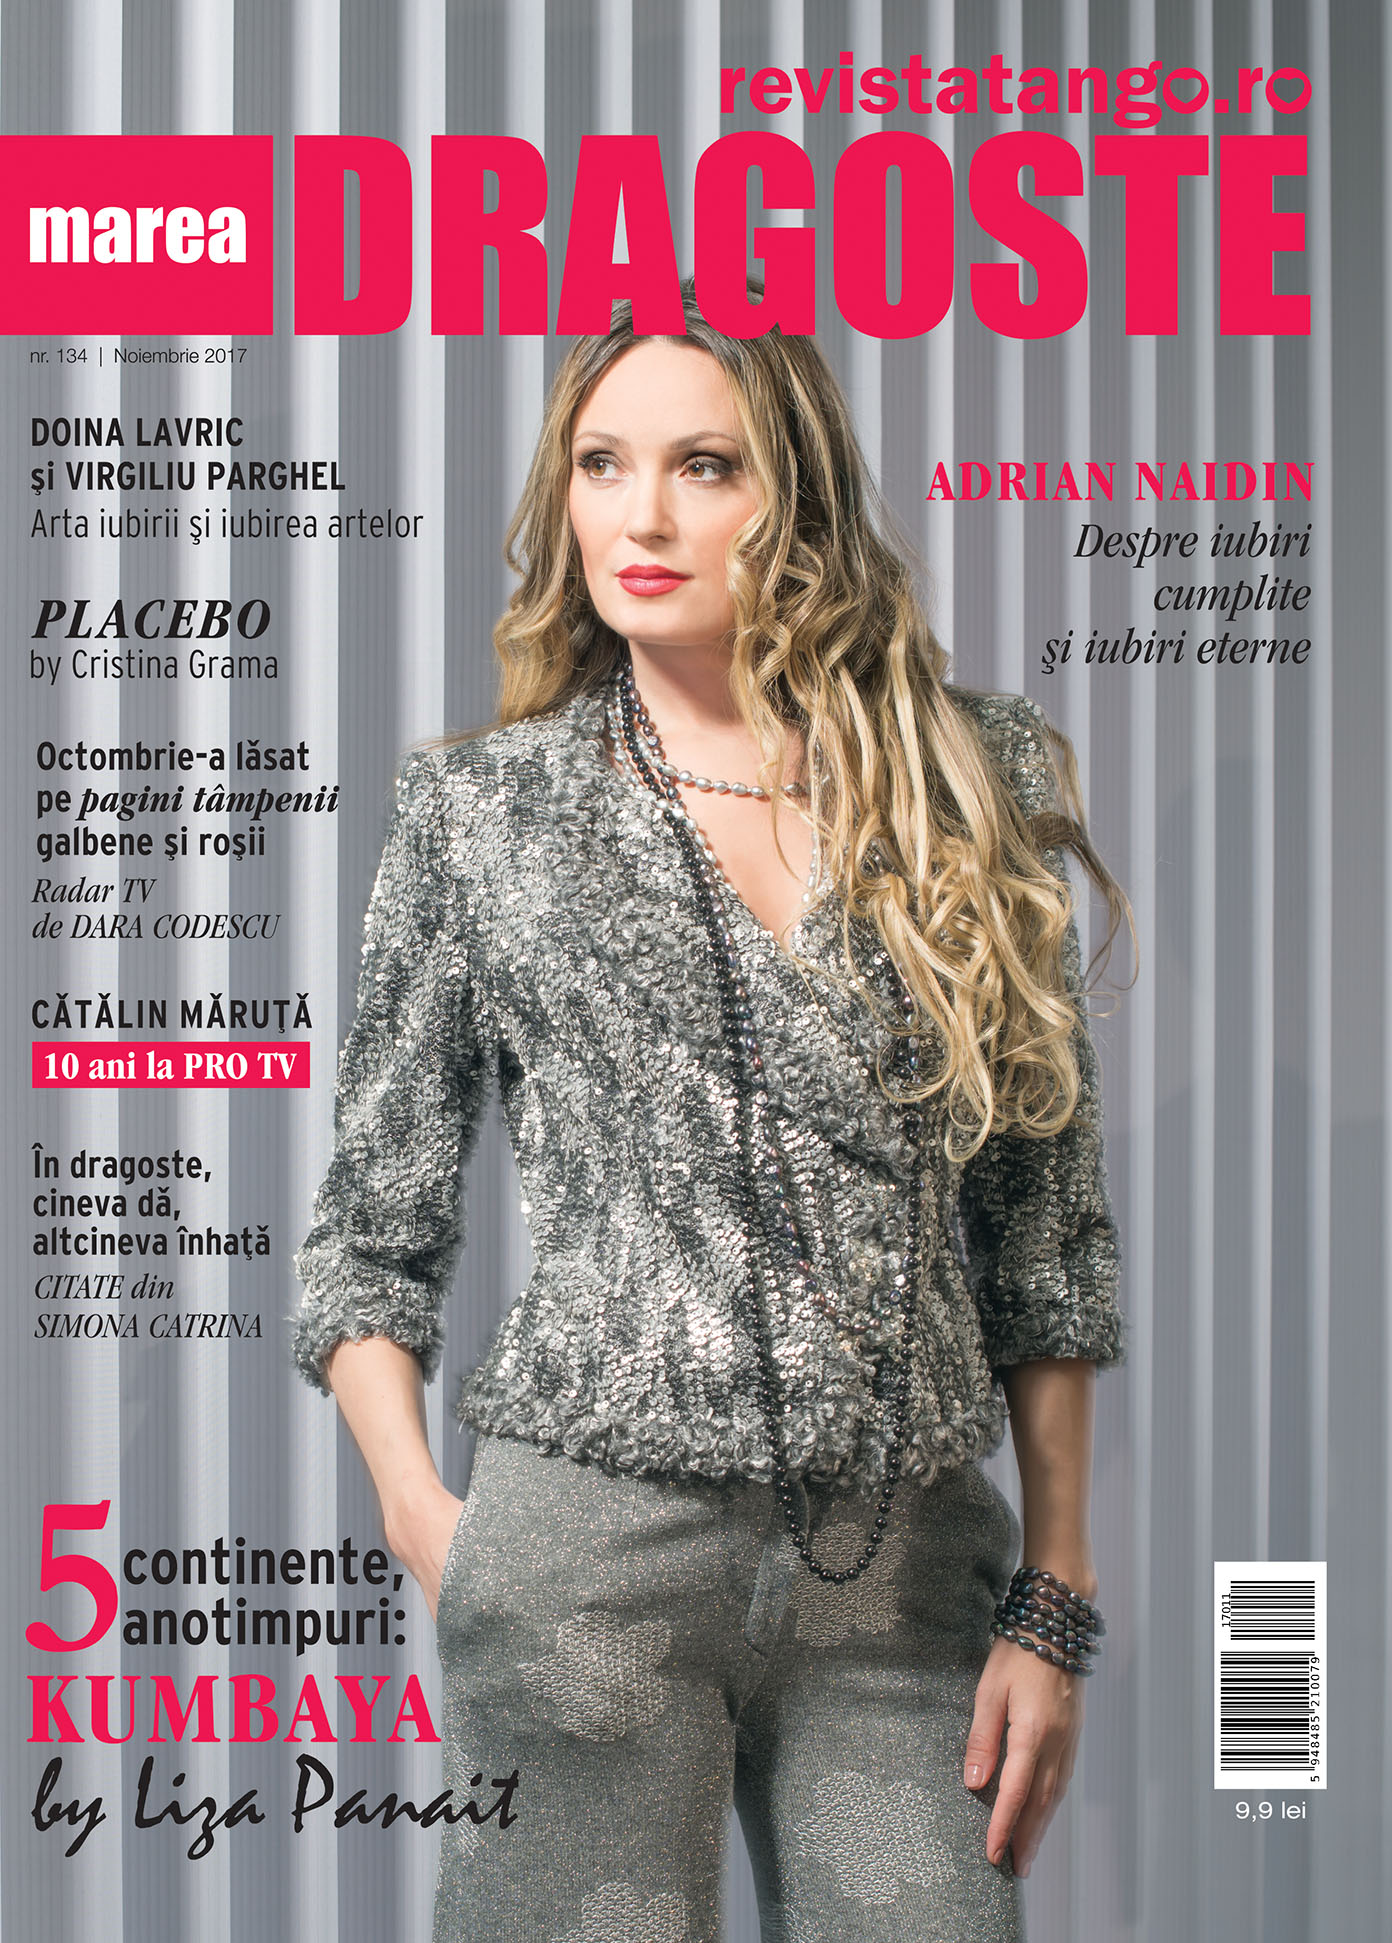 Coperta Marea Dragoste-revistatango.ro, nr. 134, noiembrie 2017